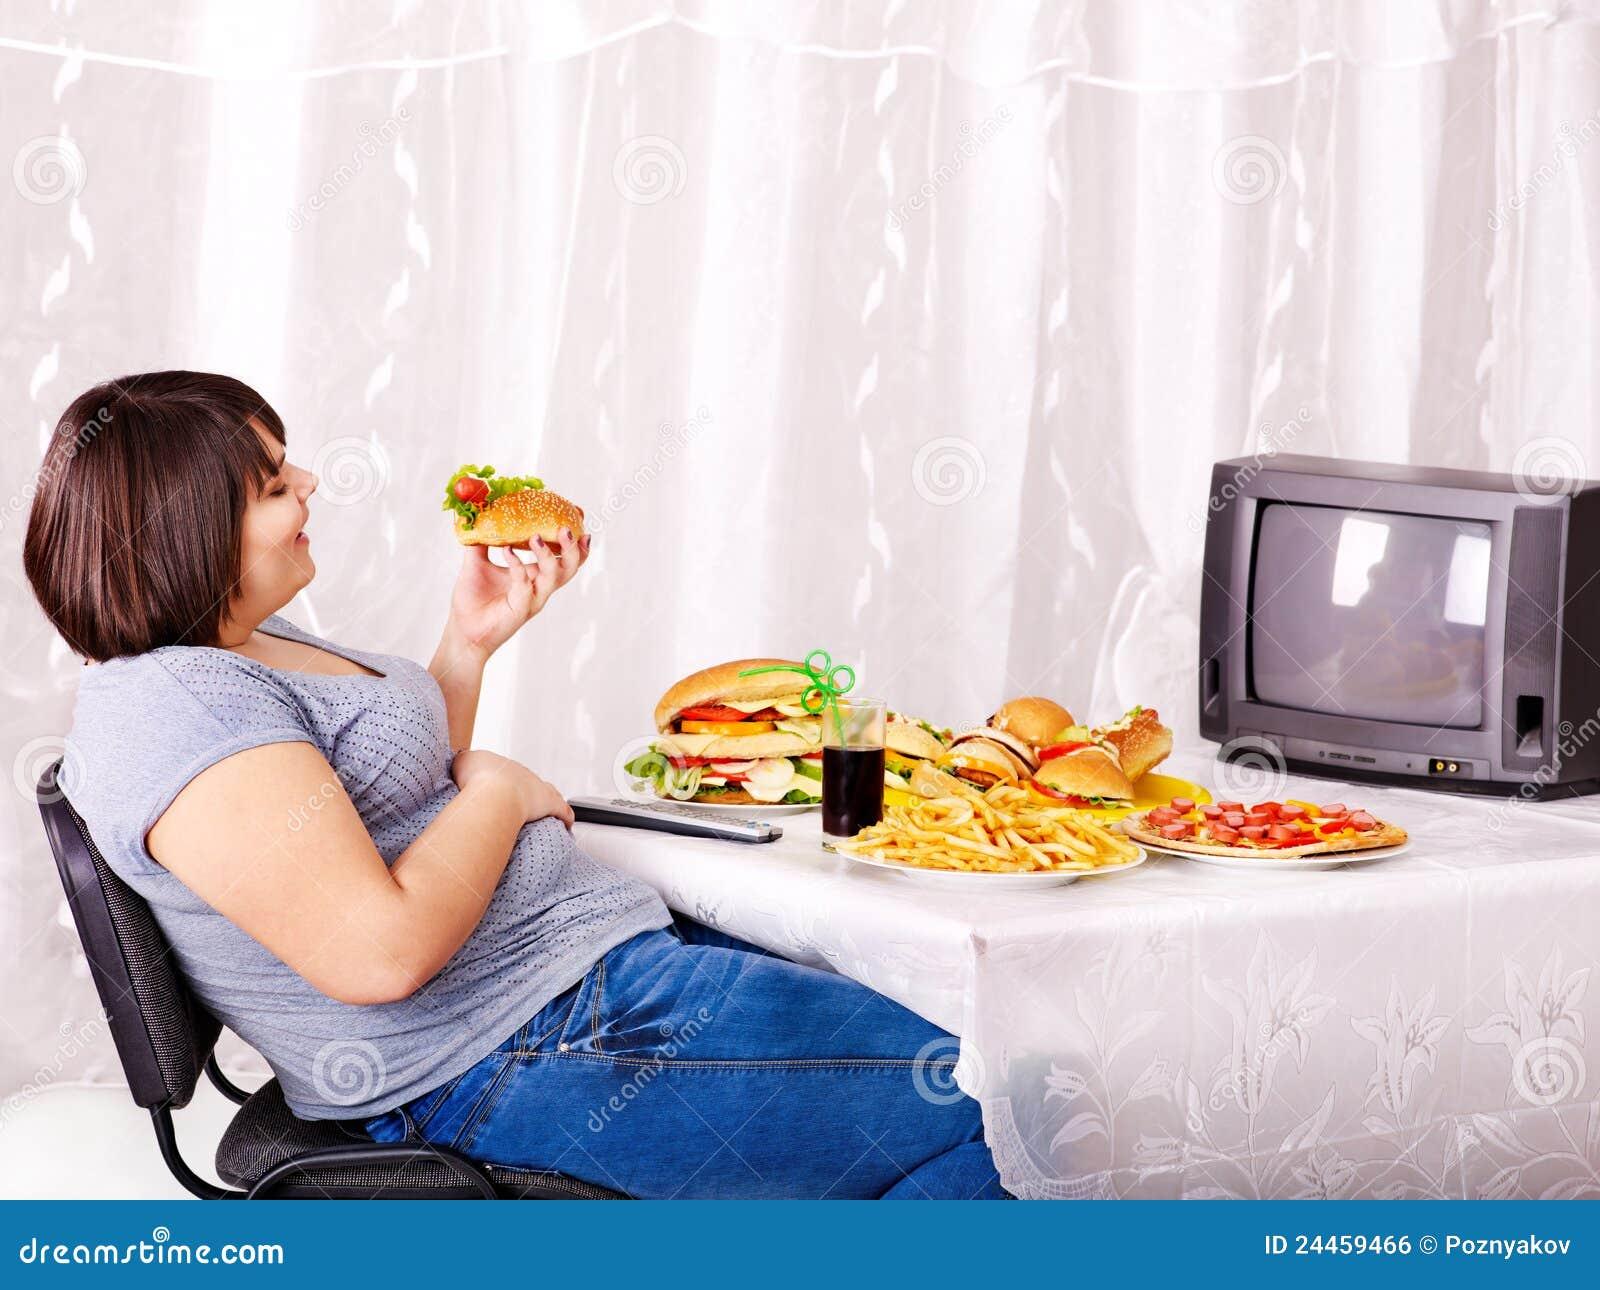 Vrouw die snel voedsel eet en op TV let.